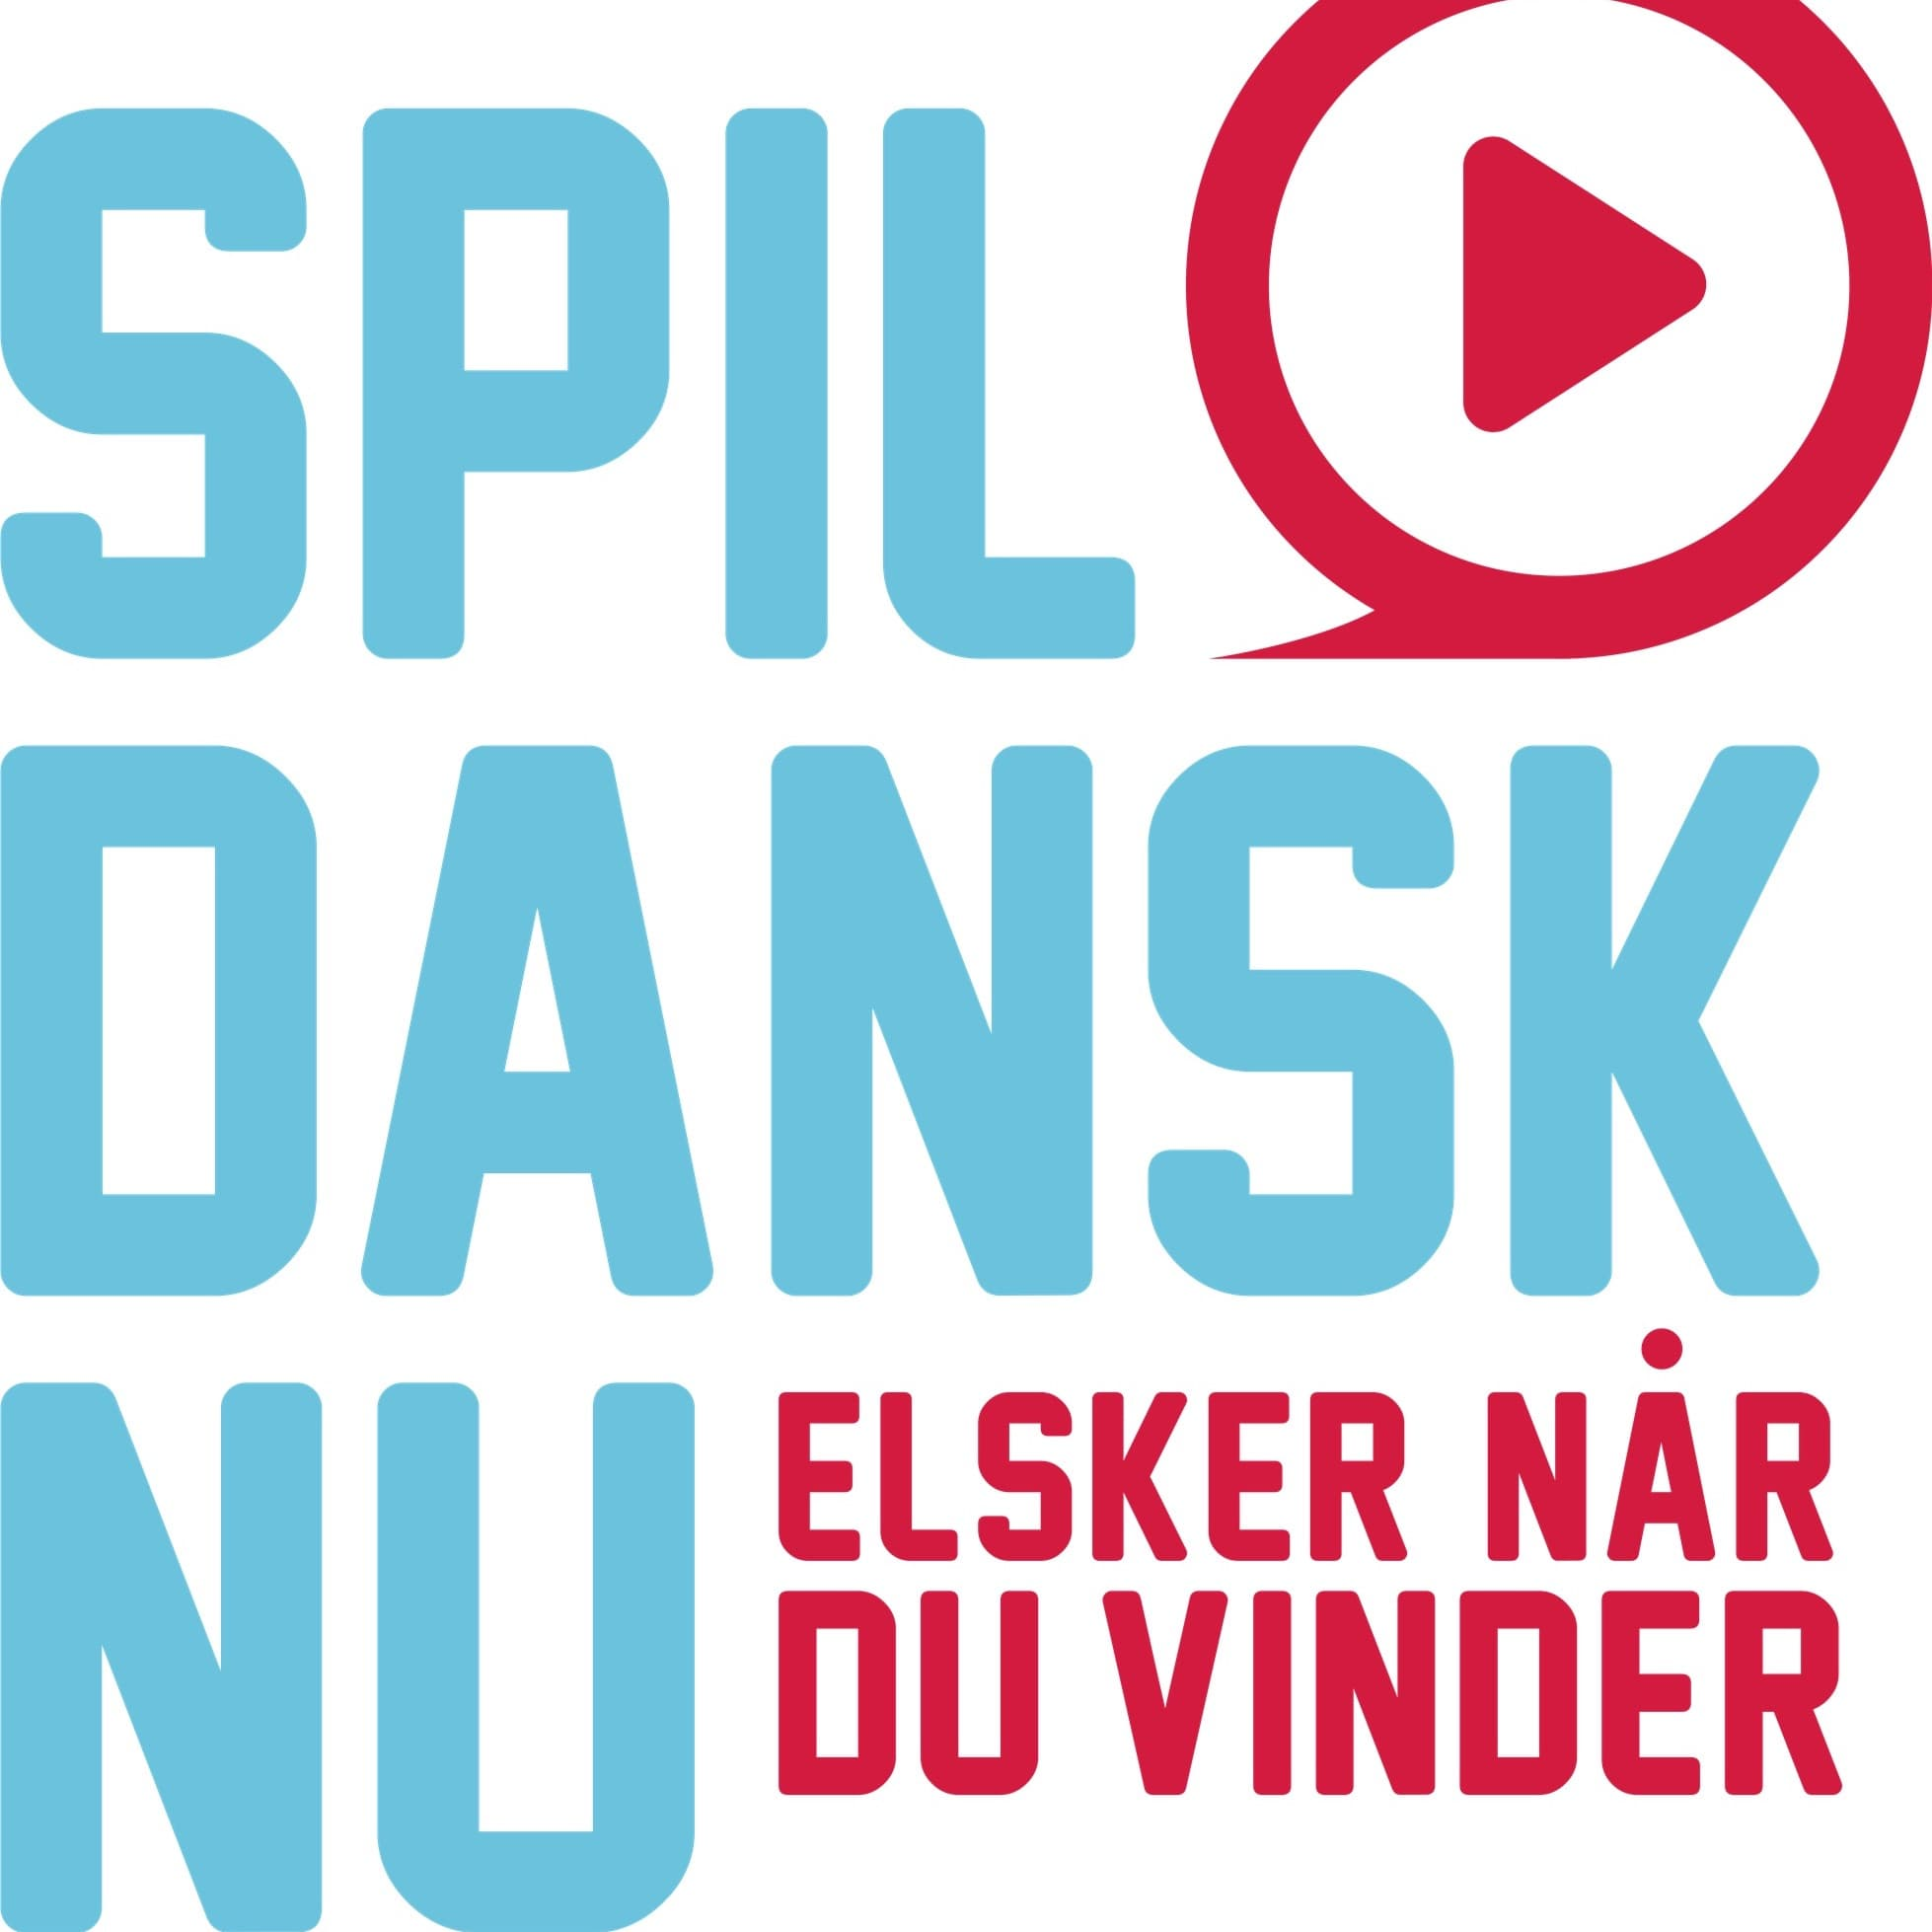 Spildansknu logo